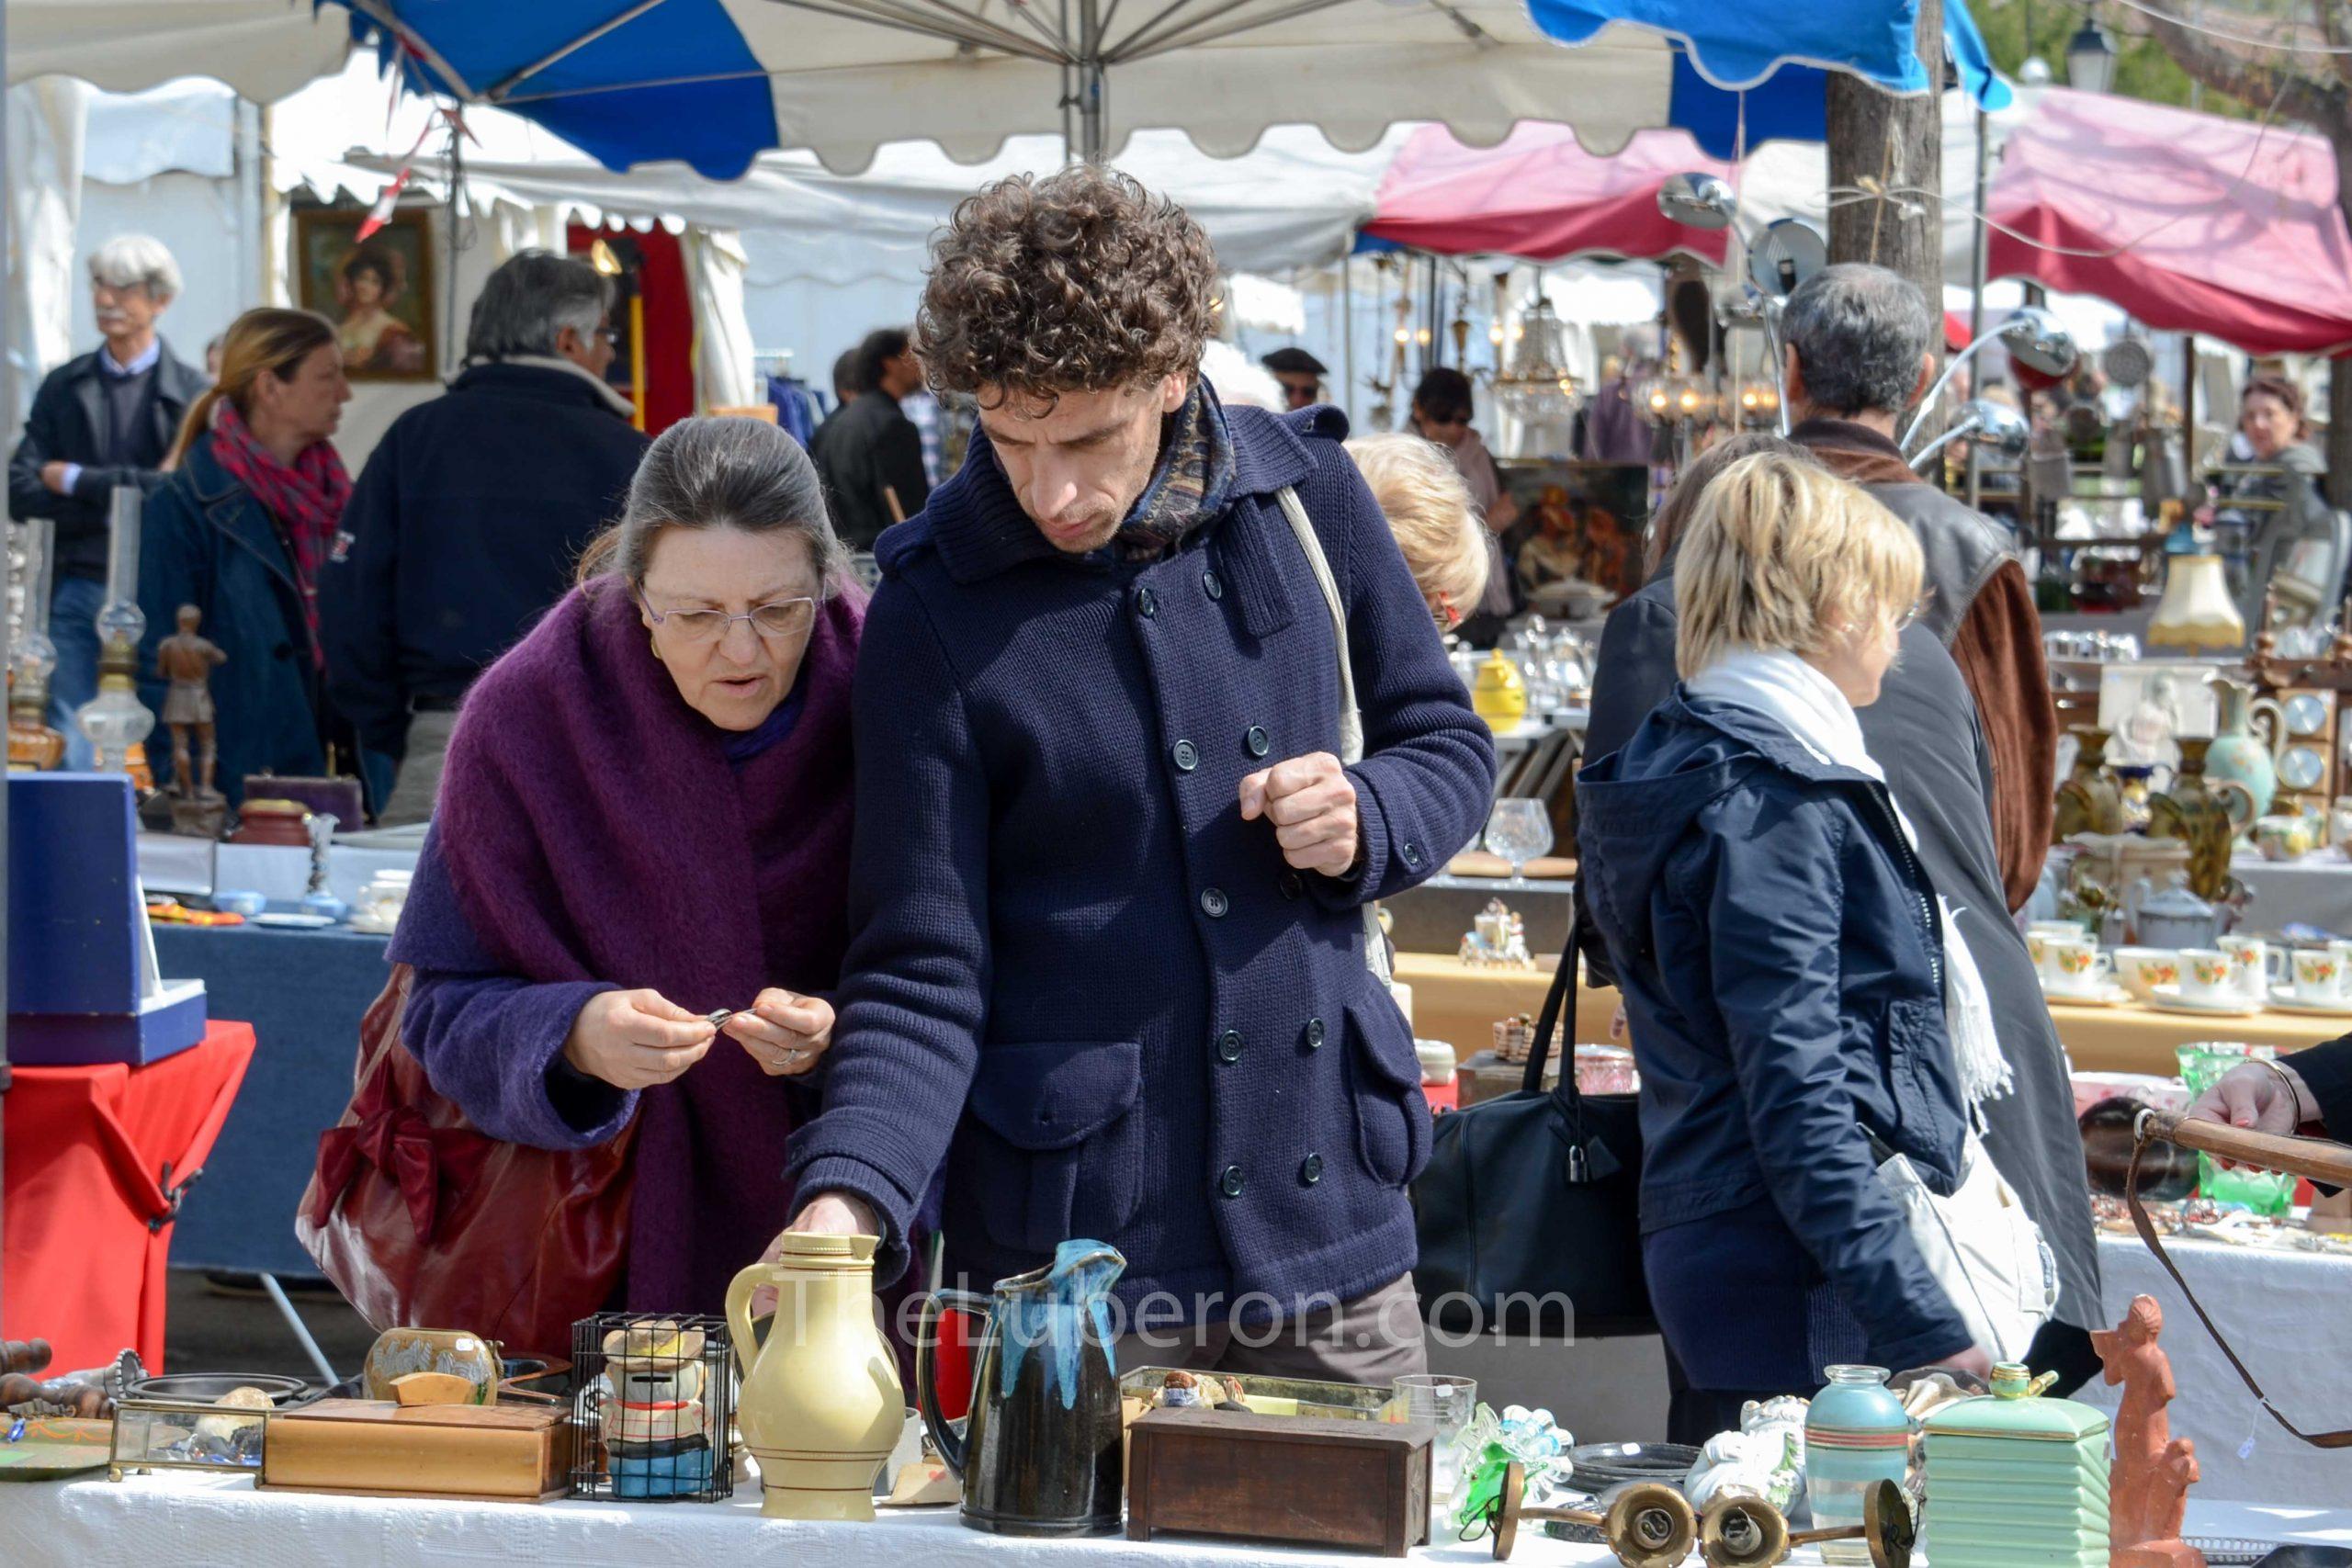 Browing stalls at L'Isle-sur-la-Sorgue bric-a-brac market